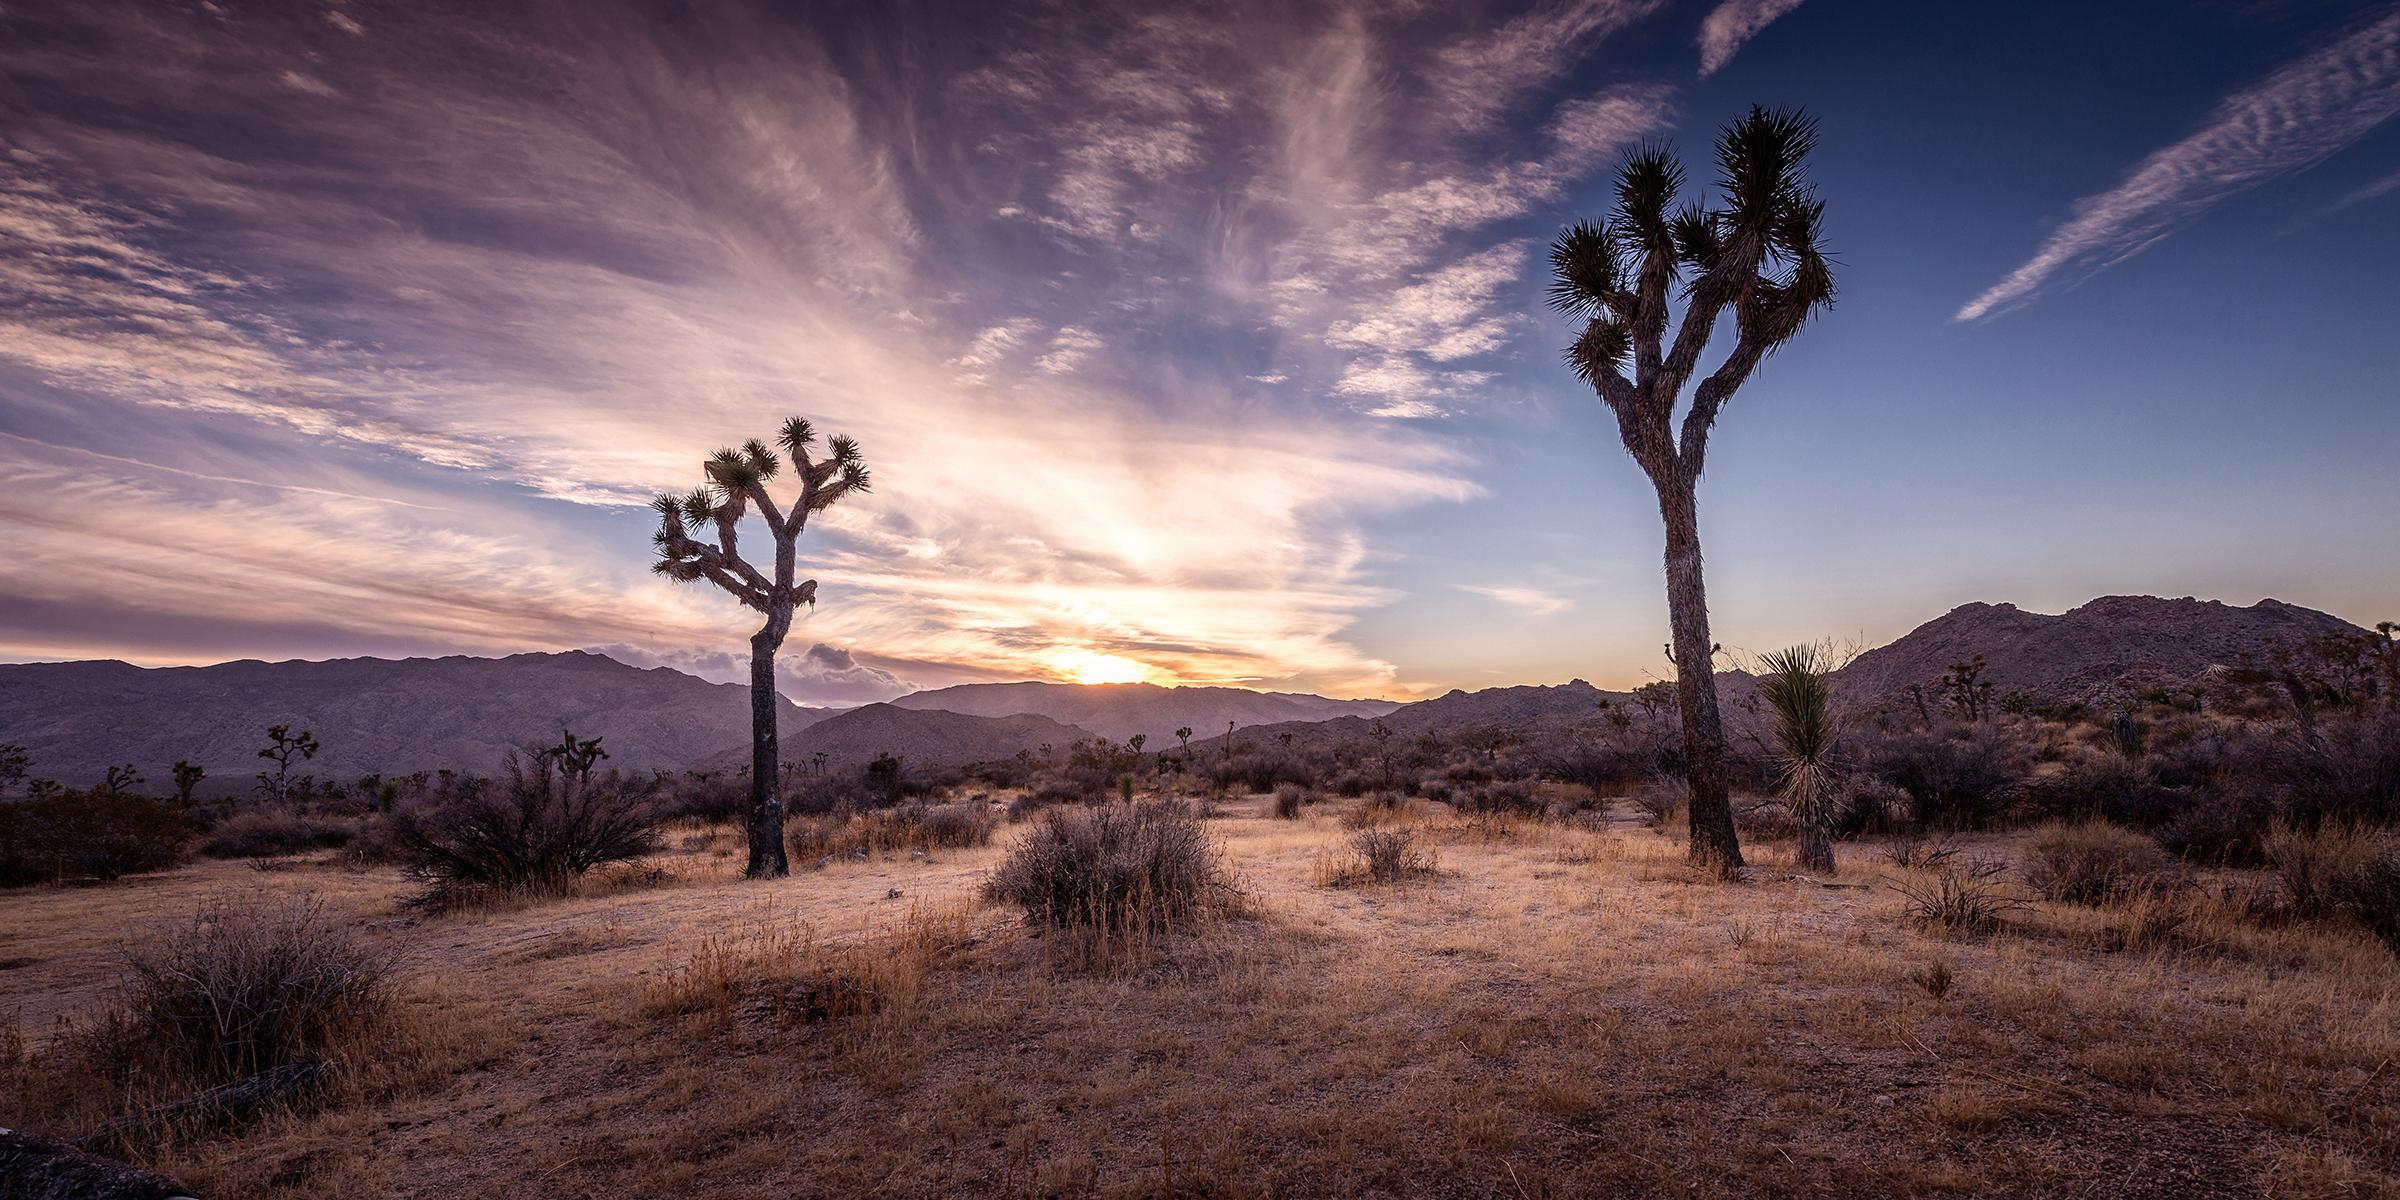 Joshua Tree Park, California